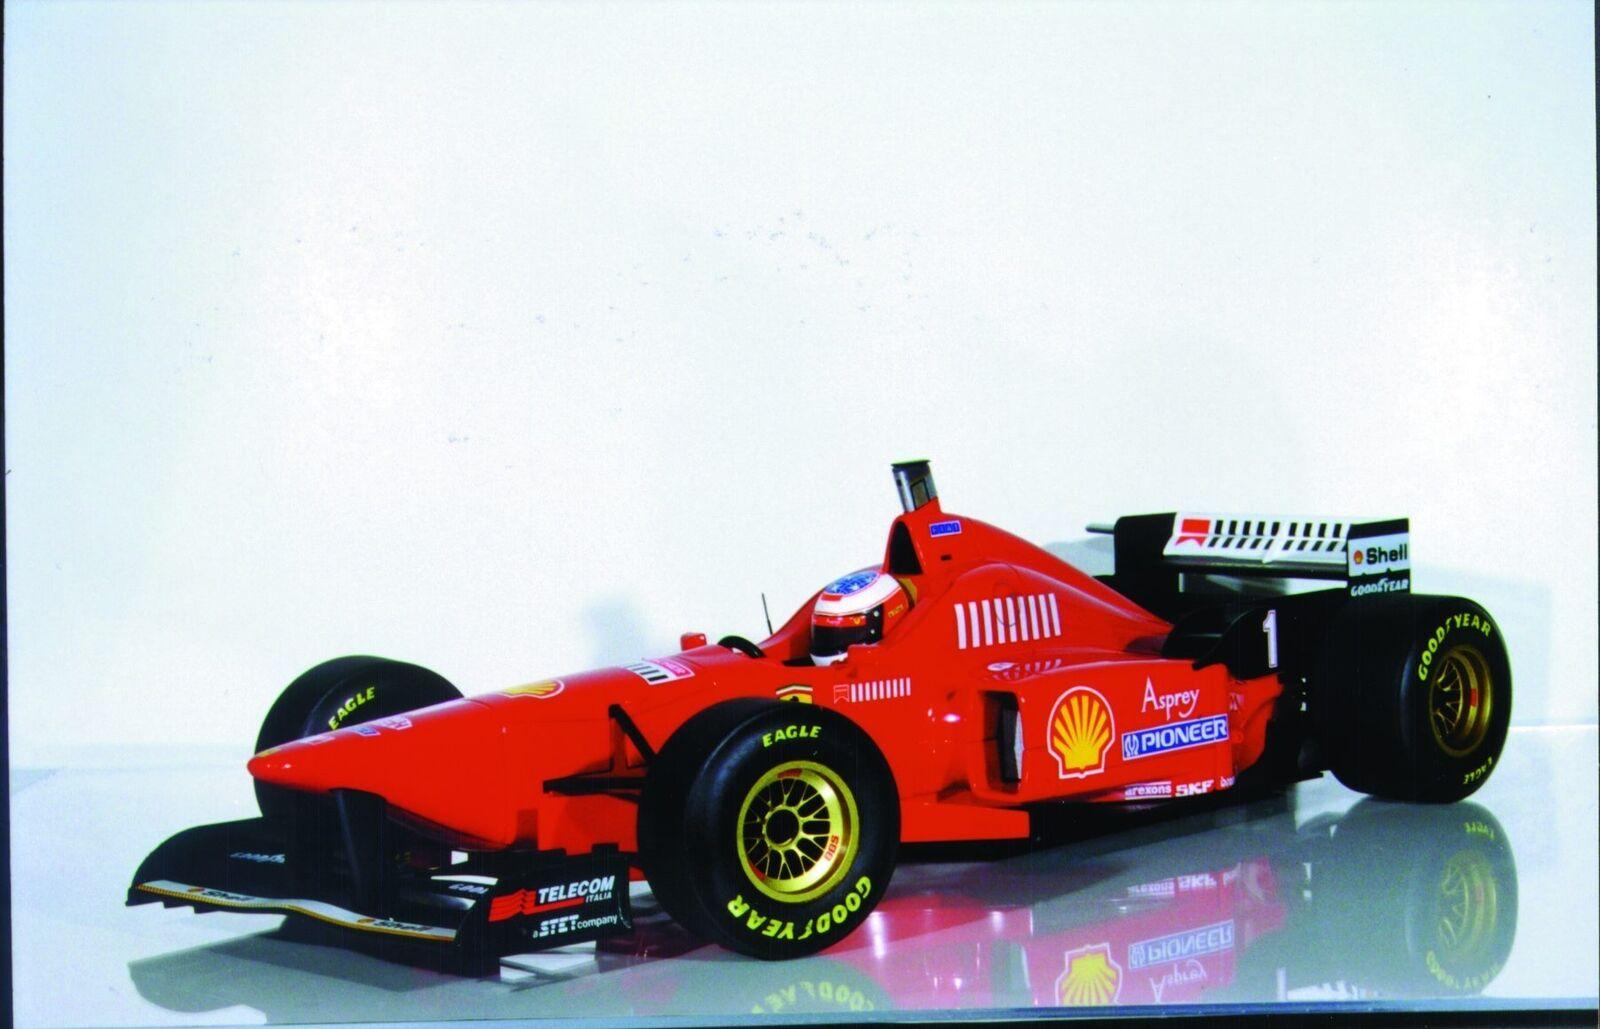 Minichamps Ferrari F310'96 1 Schumacher